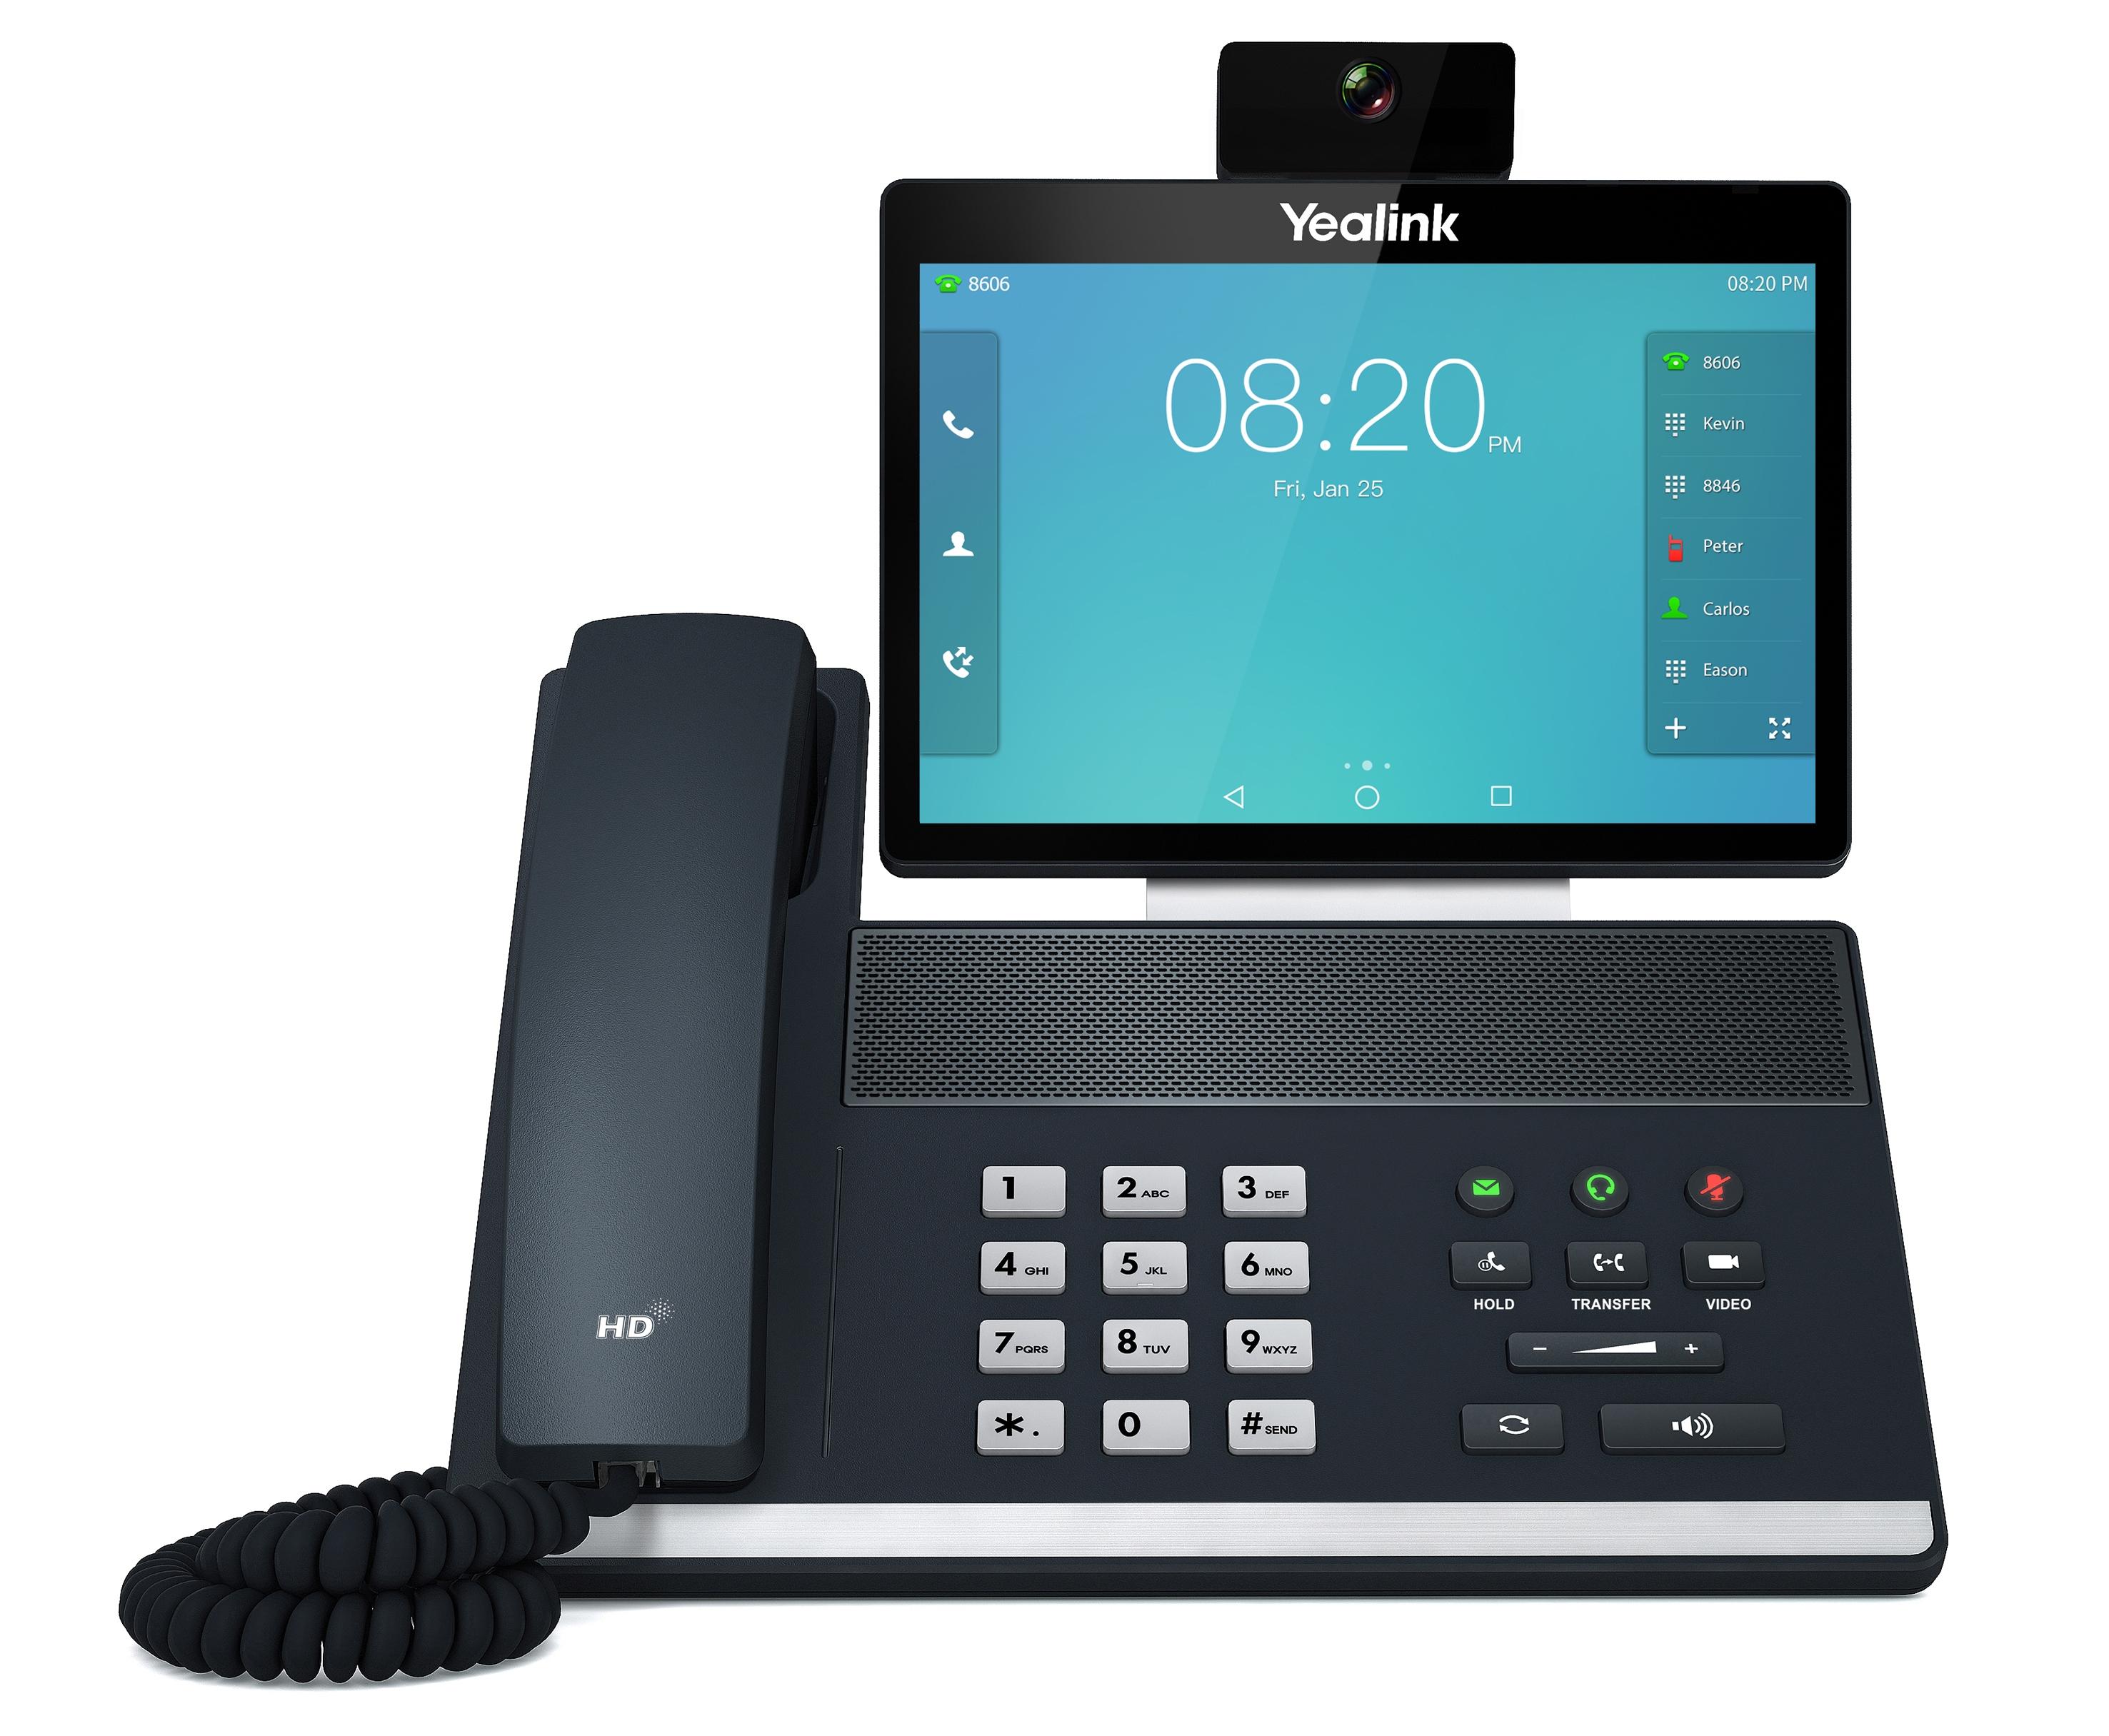 Yealink VP59 Smart Video IP Phone - VoIP Supply